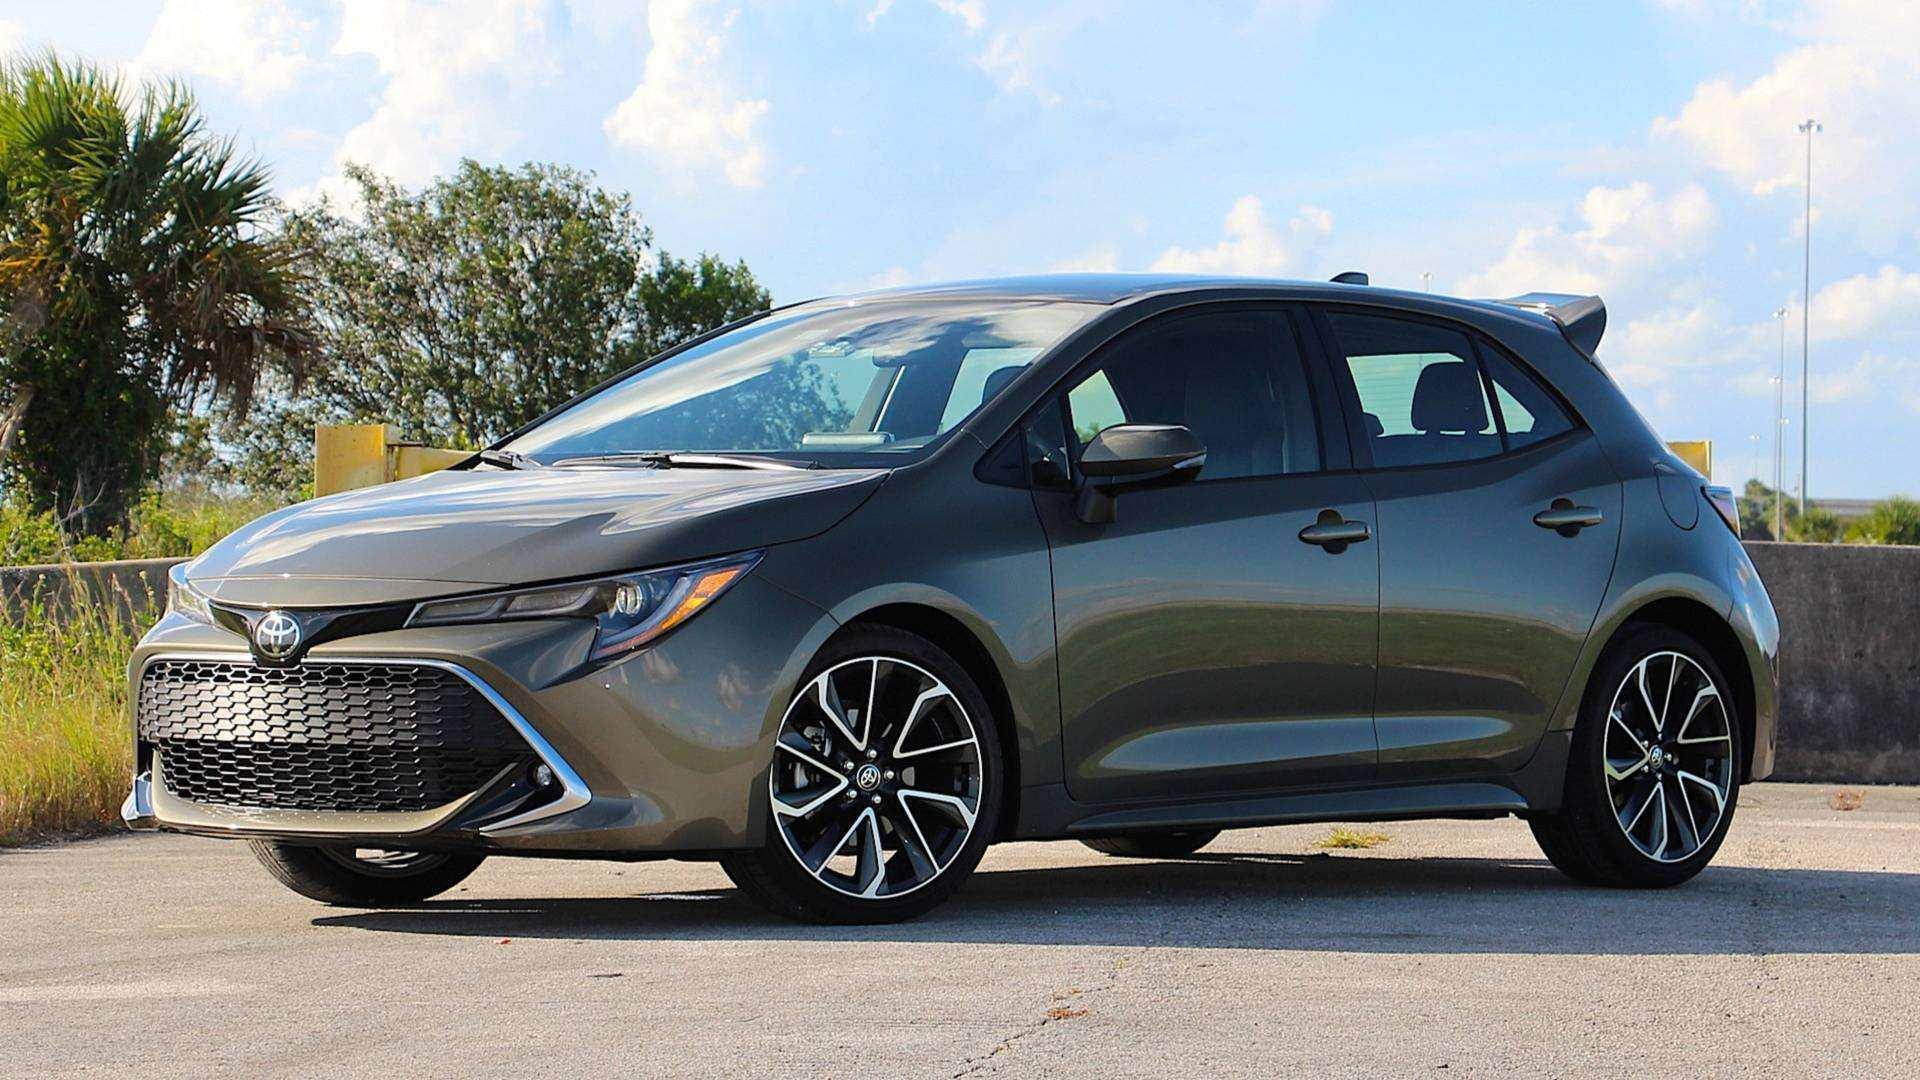 82 All New 2019 Toyota Corolla Hatchback Configurations with 2019 Toyota Corolla Hatchback